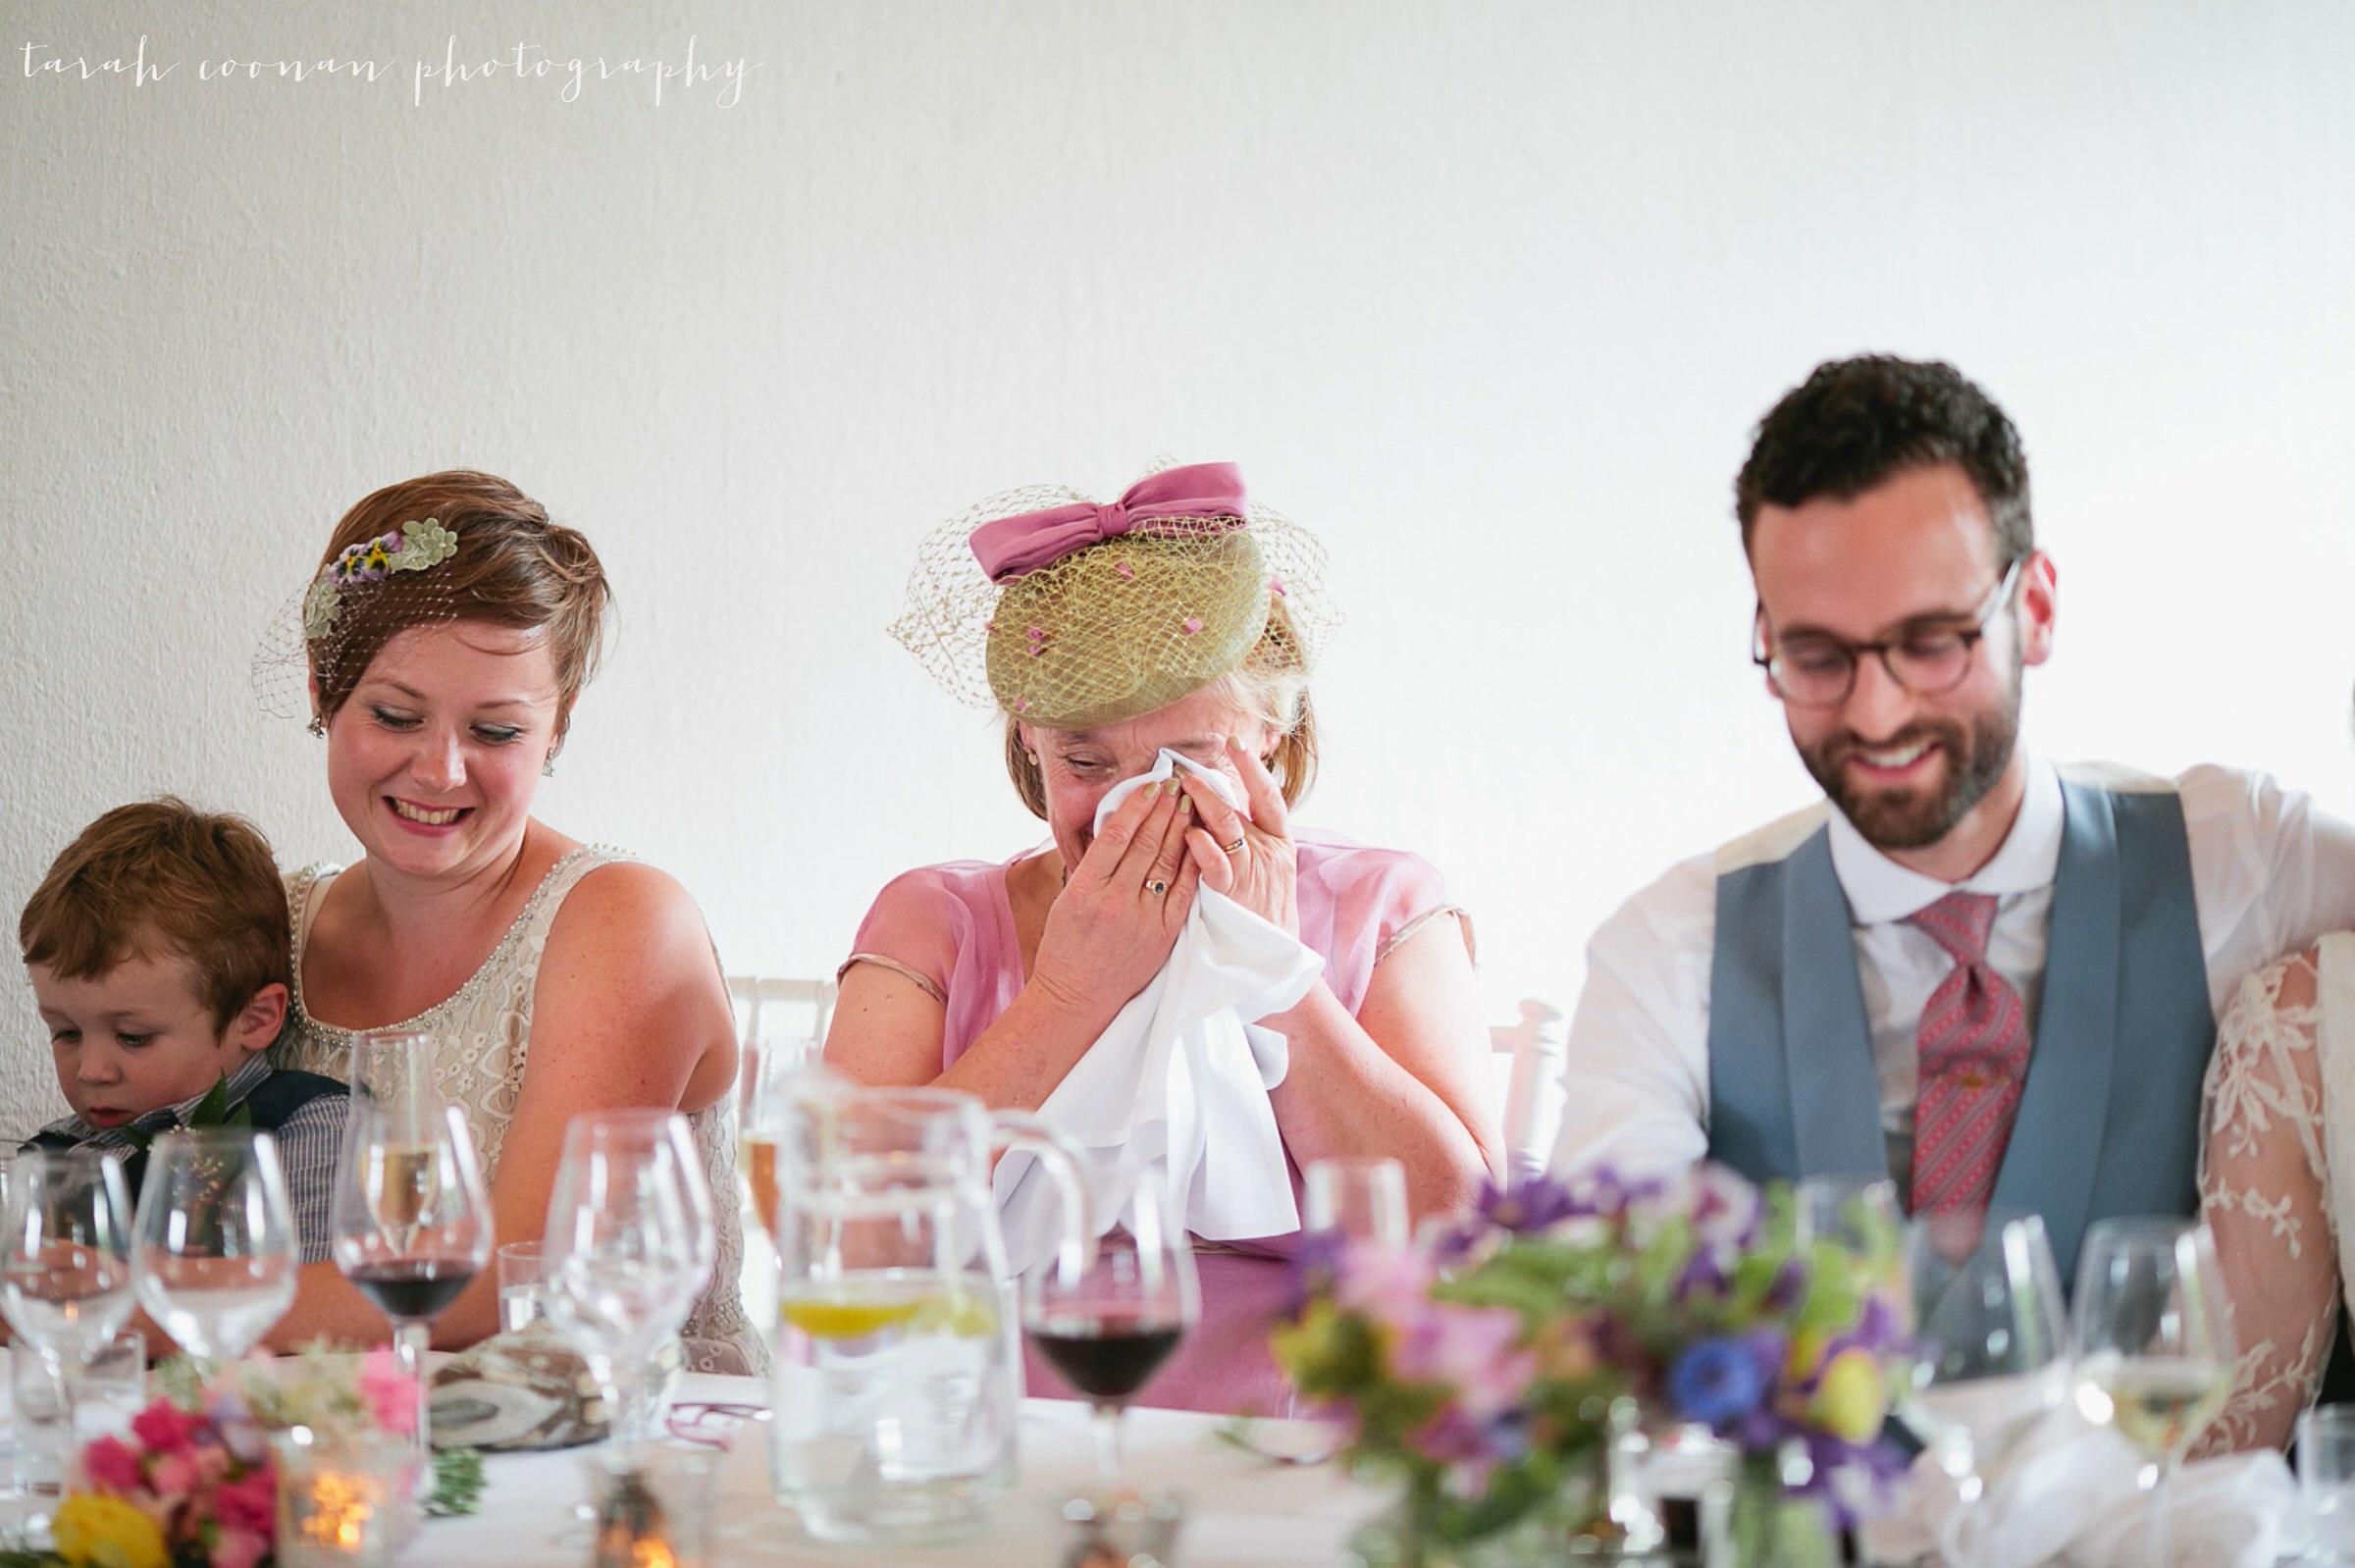 brighton-wedding-photographer93